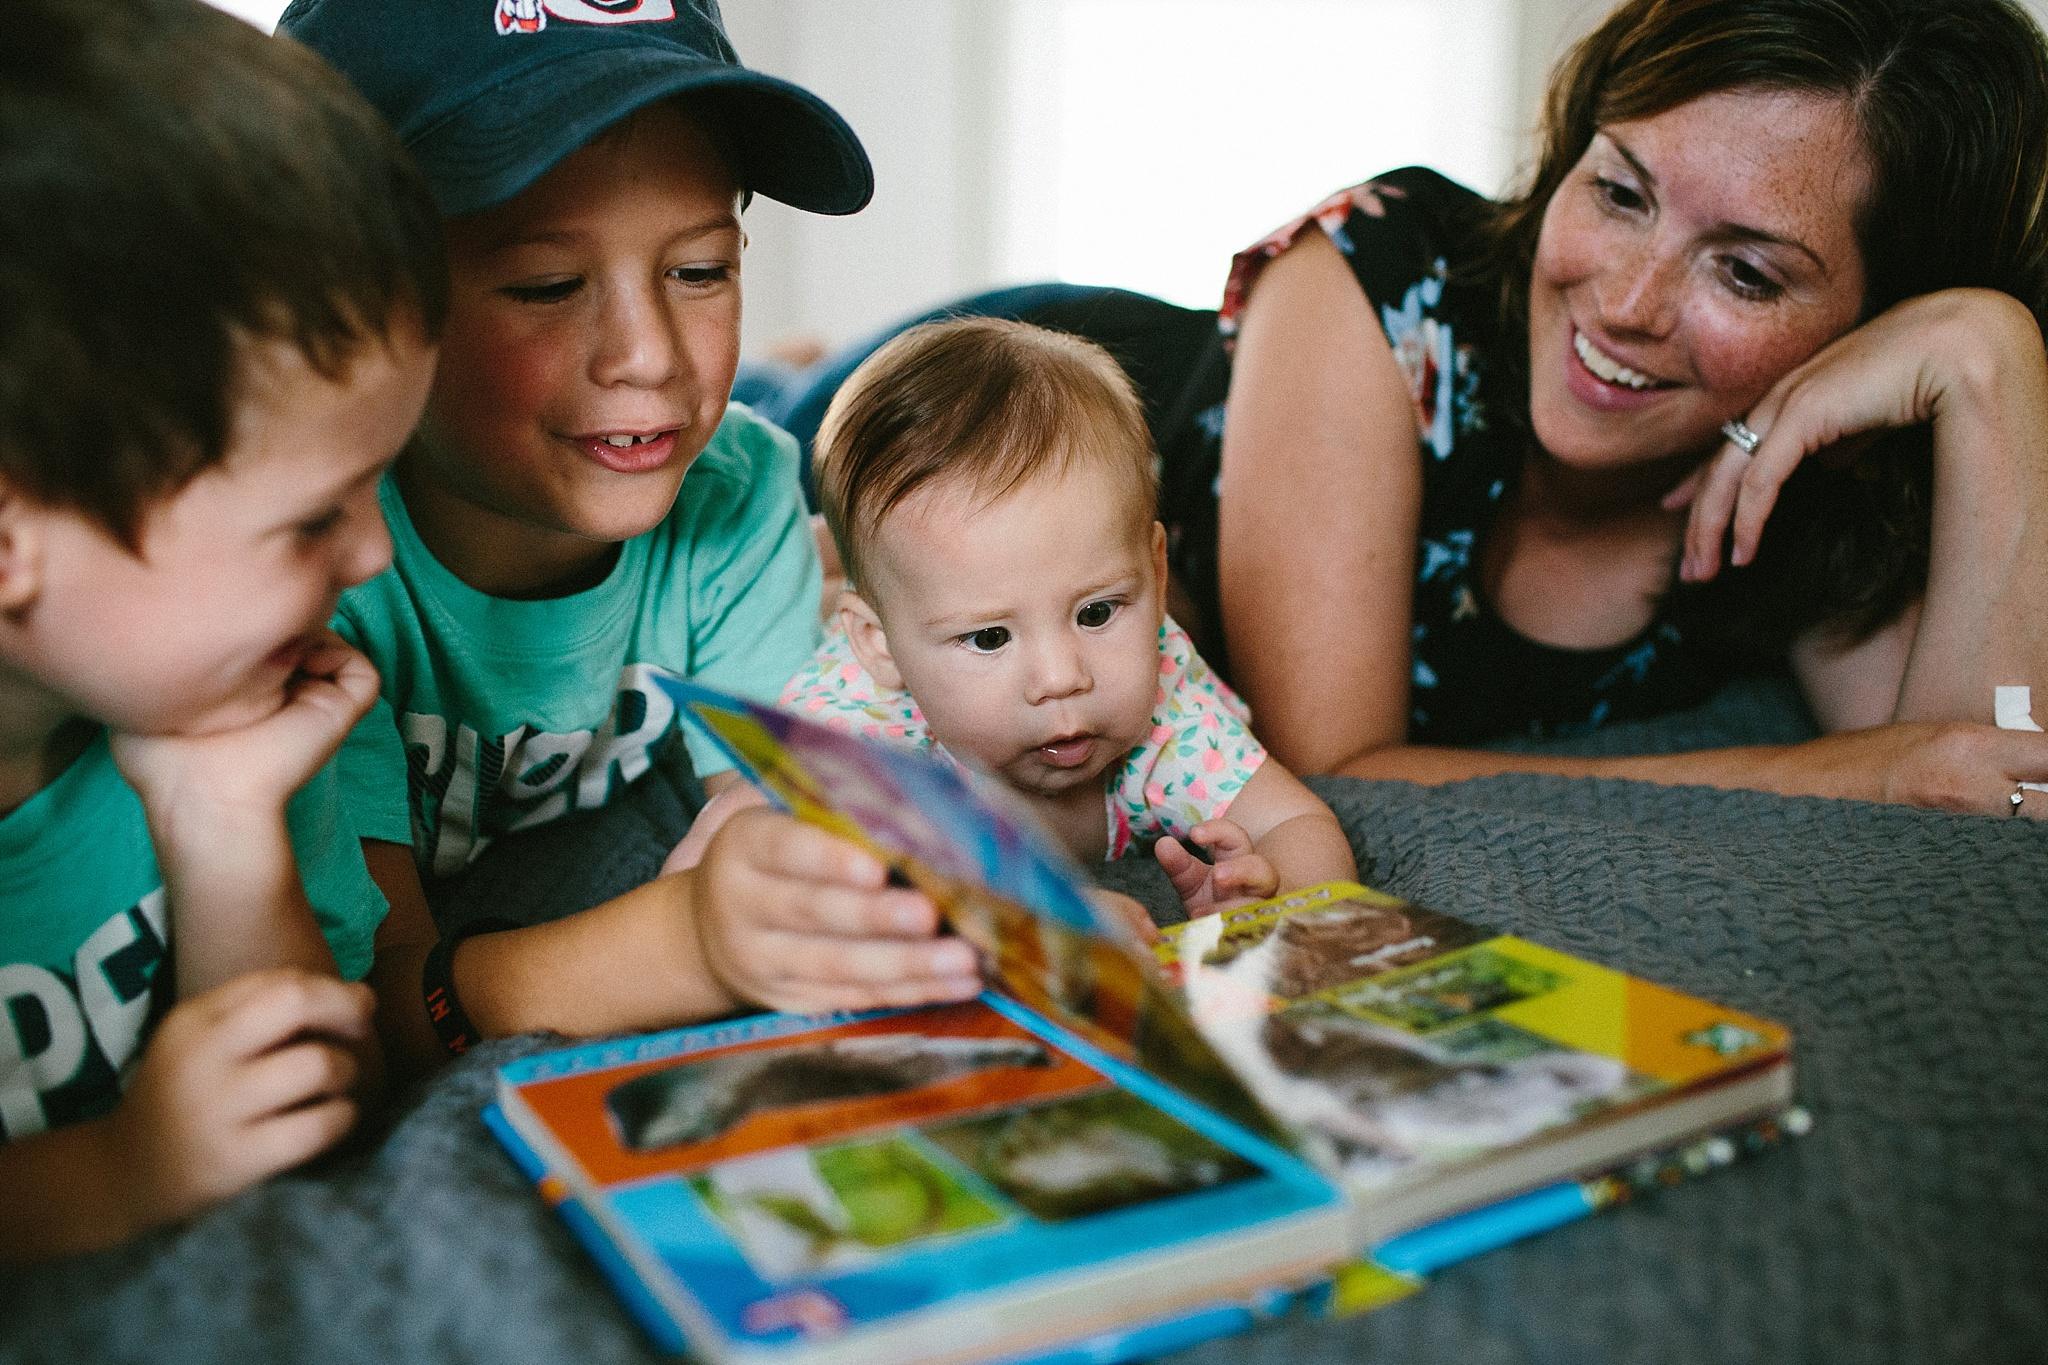 KellyLappPhotography_documentaryfamilyphotography_lancasterfamilyphotographer_scheffel_22.JPG